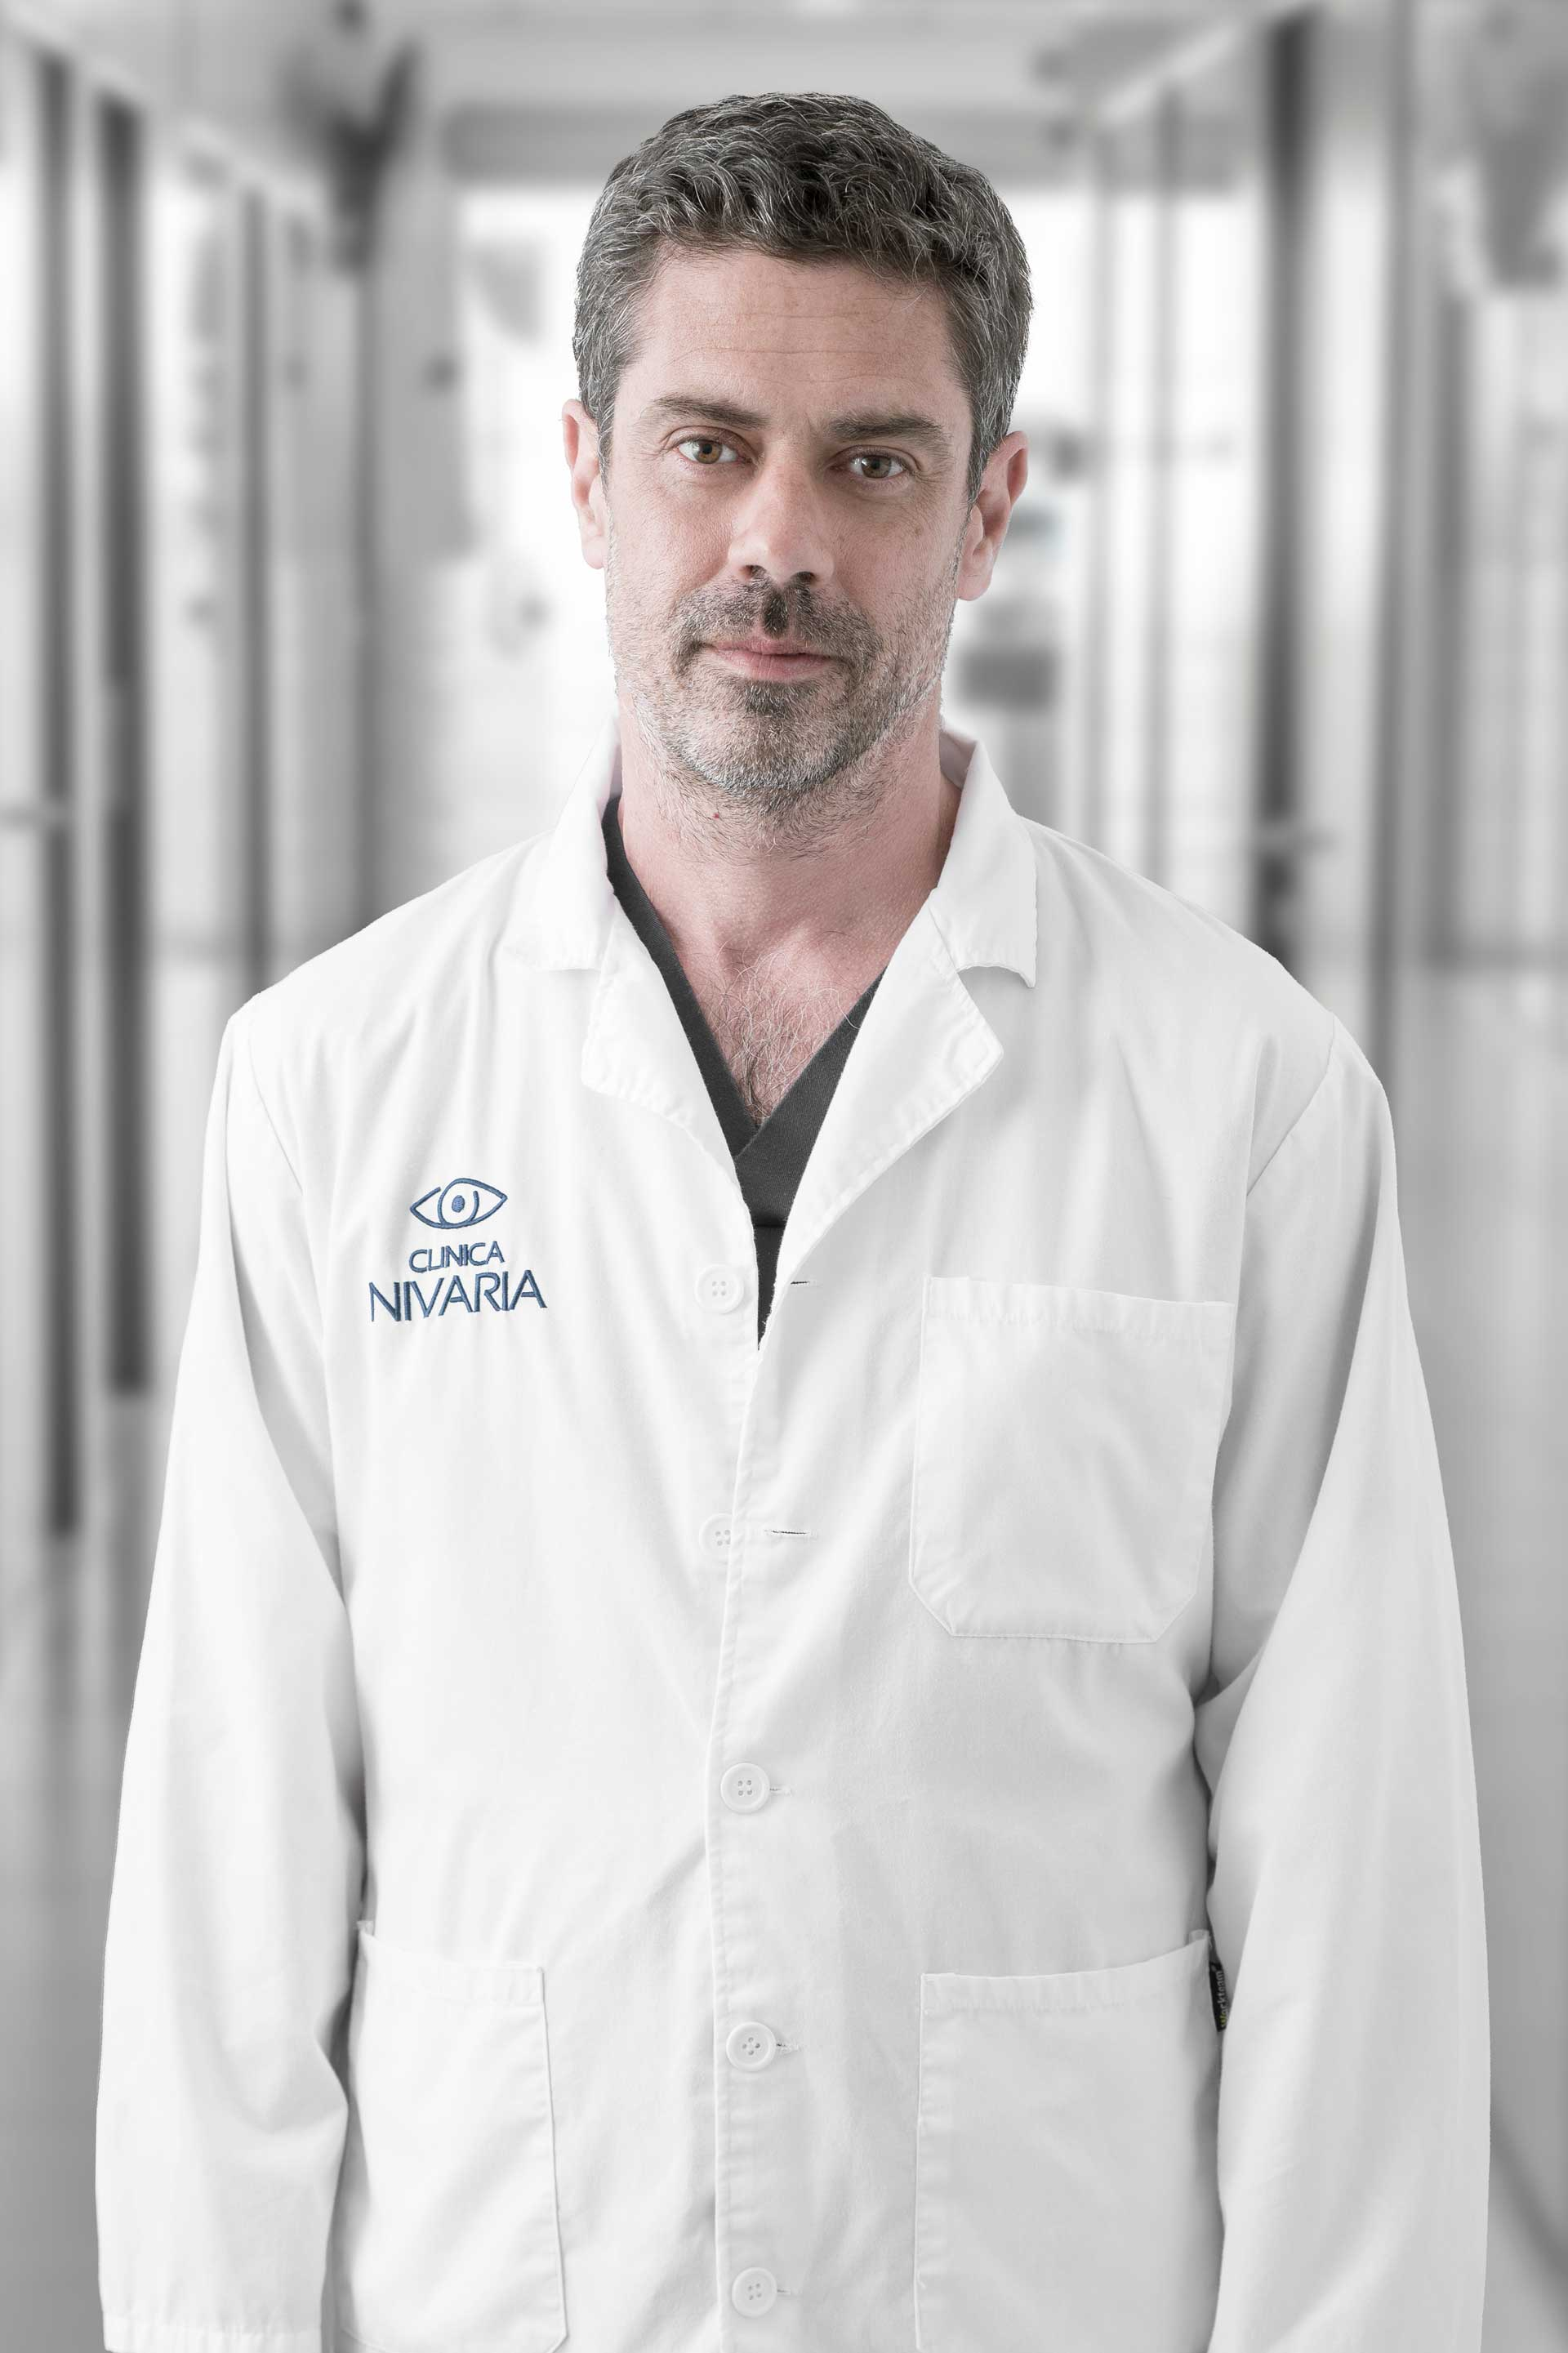 Dr. Manuel Sánchez-Gijón